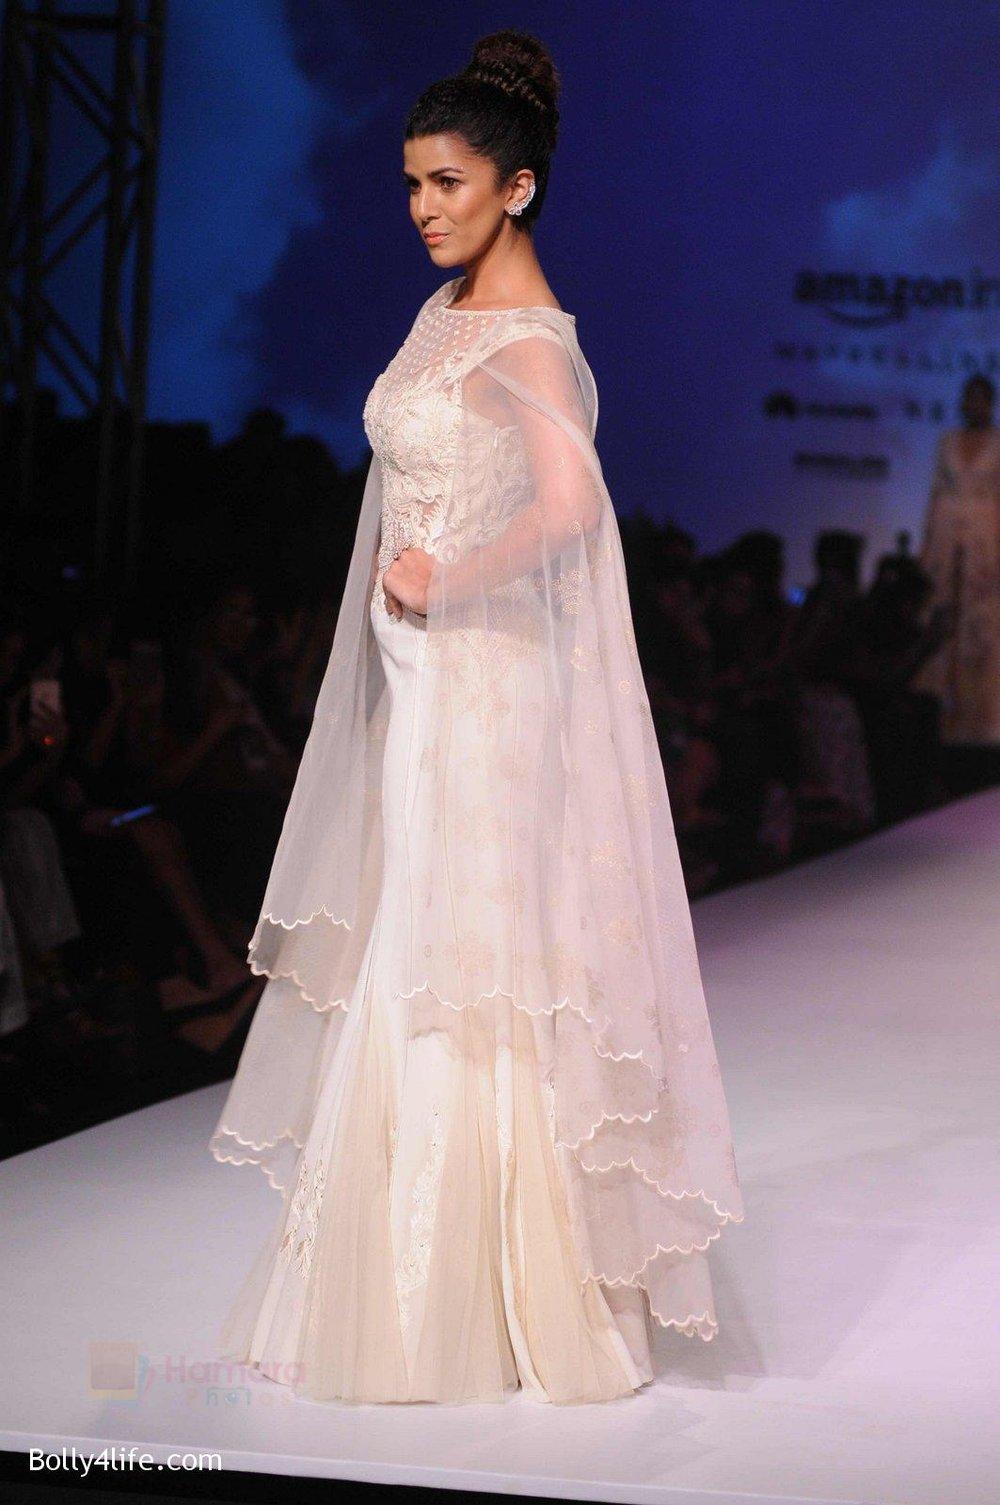 Nimrat-Kaur-walk-the-ramp-for-Mandira-Wrik_s-show-at-Amazon-India-Fashion-Week-on-15th-Oct-2016-42.jpg